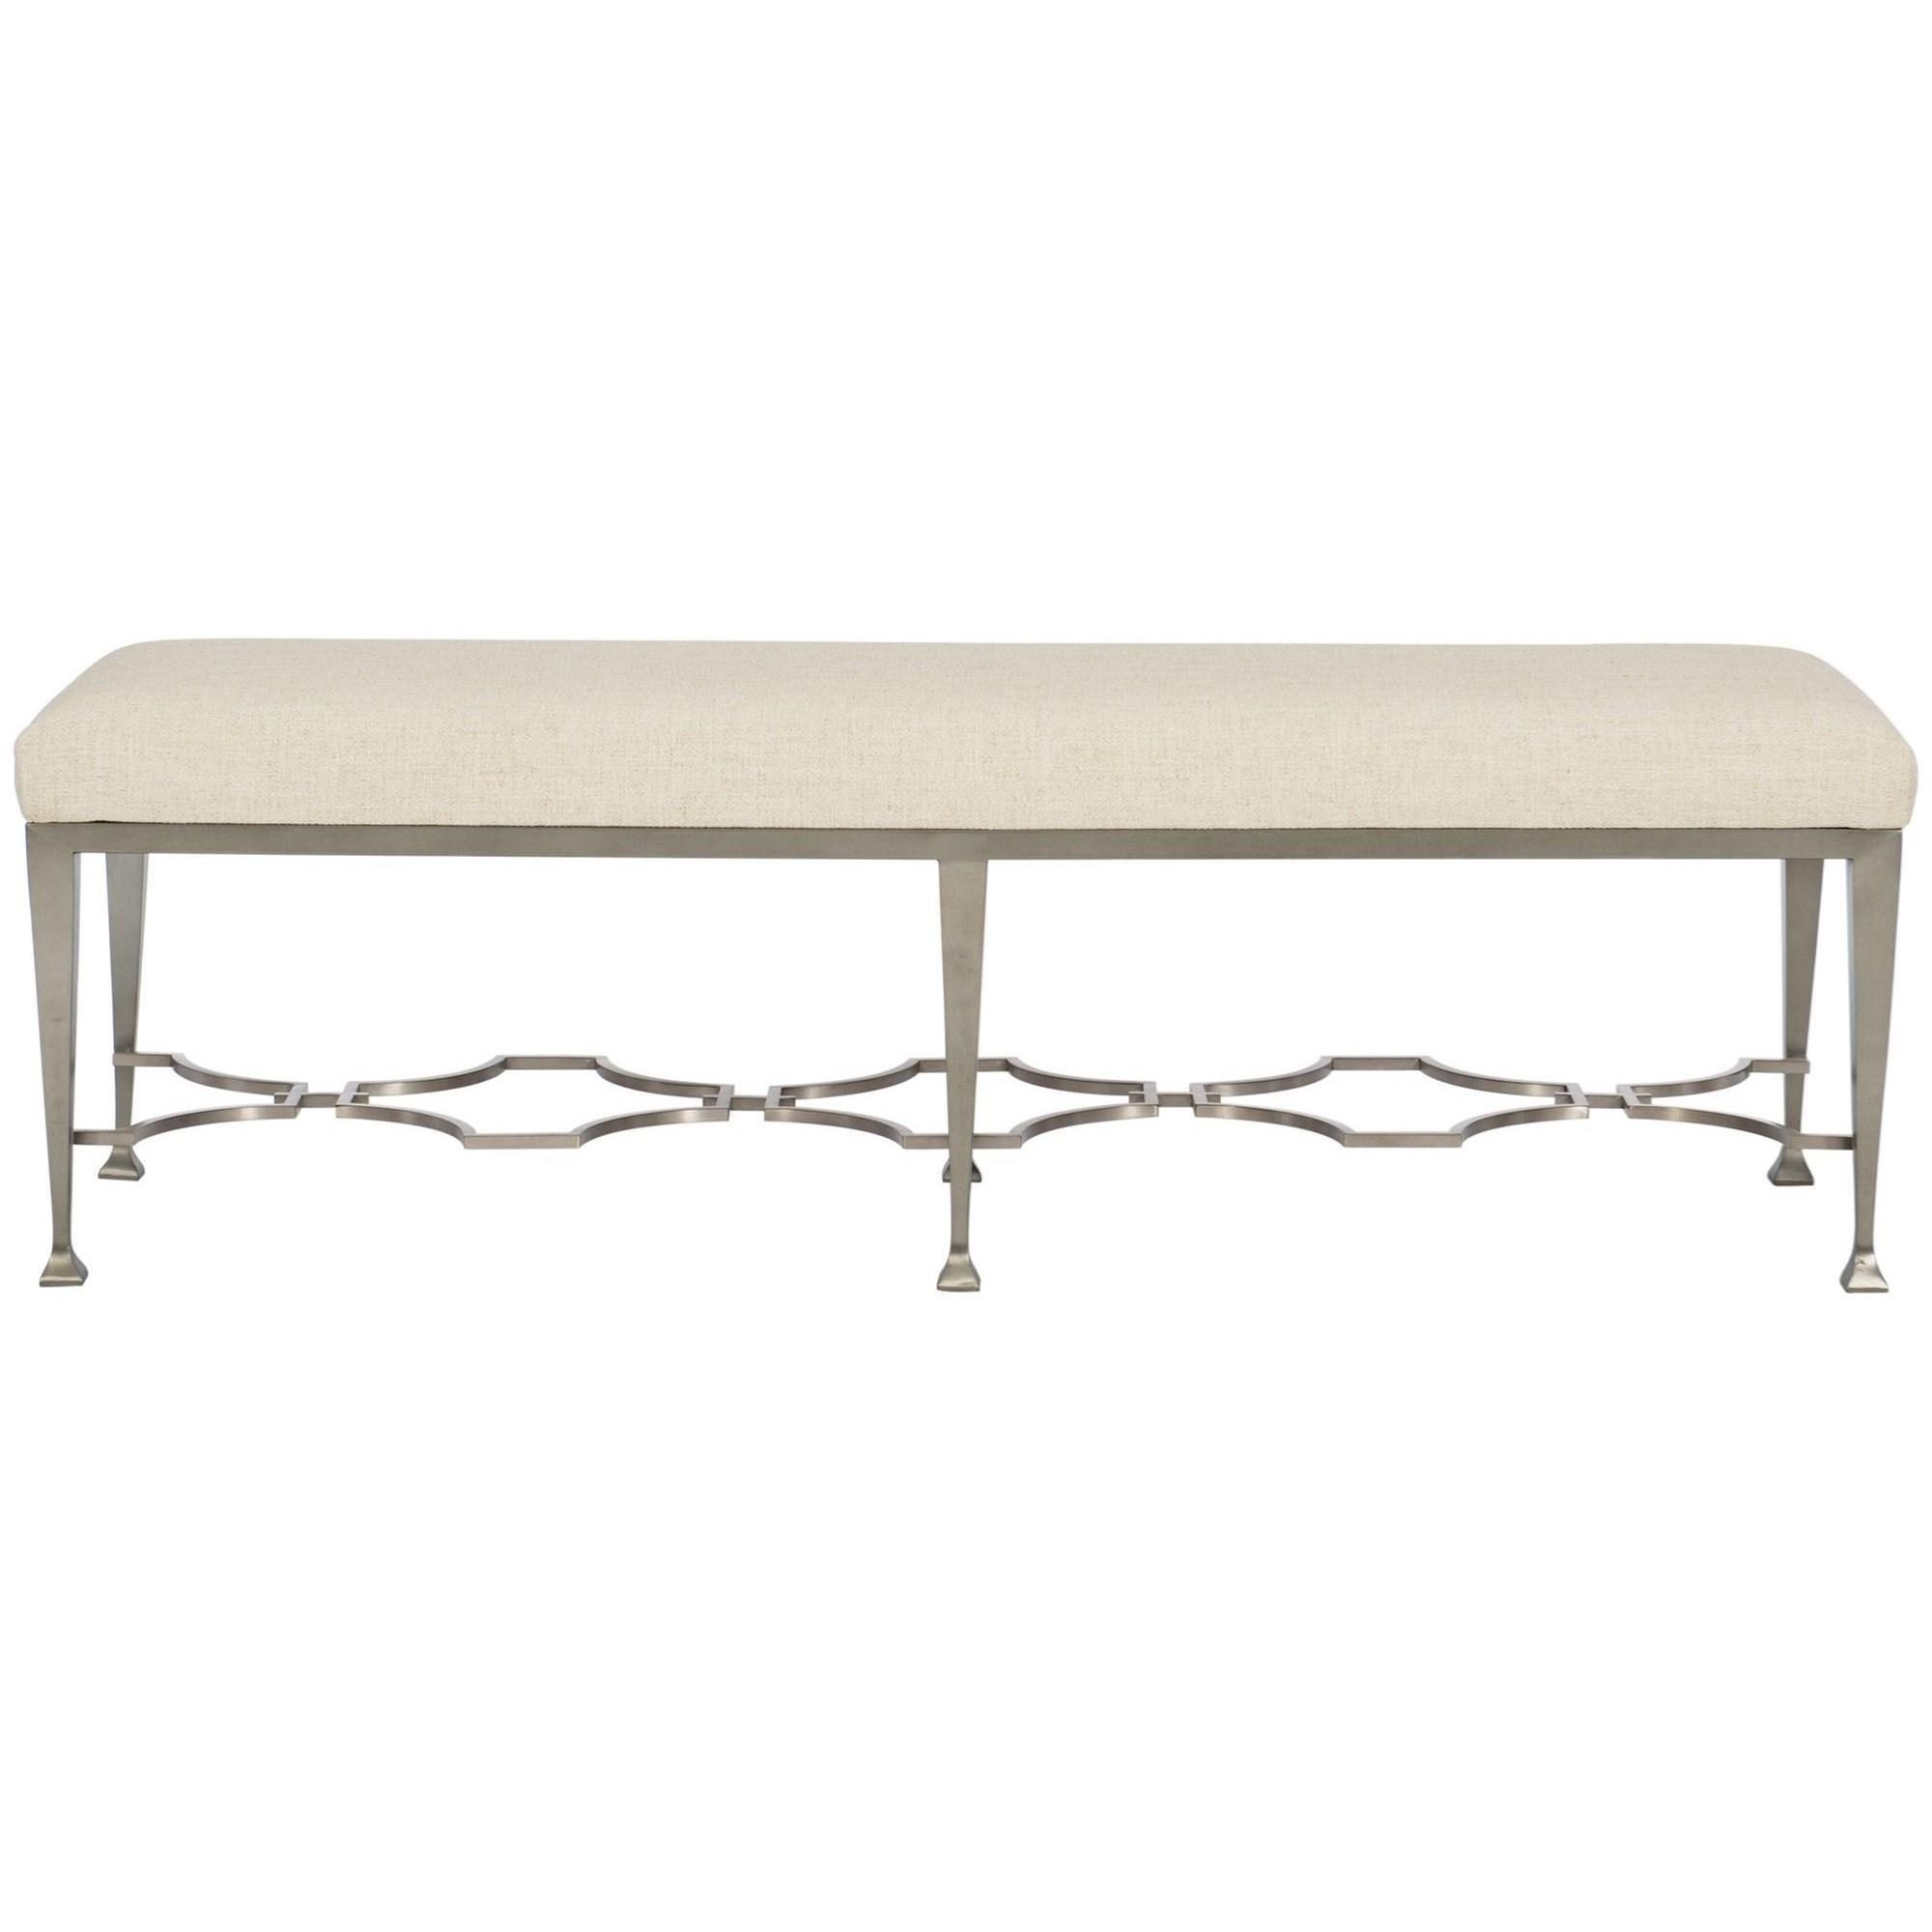 Santa Barbara Customizable Metal Bench by Bernhardt at Baer's Furniture